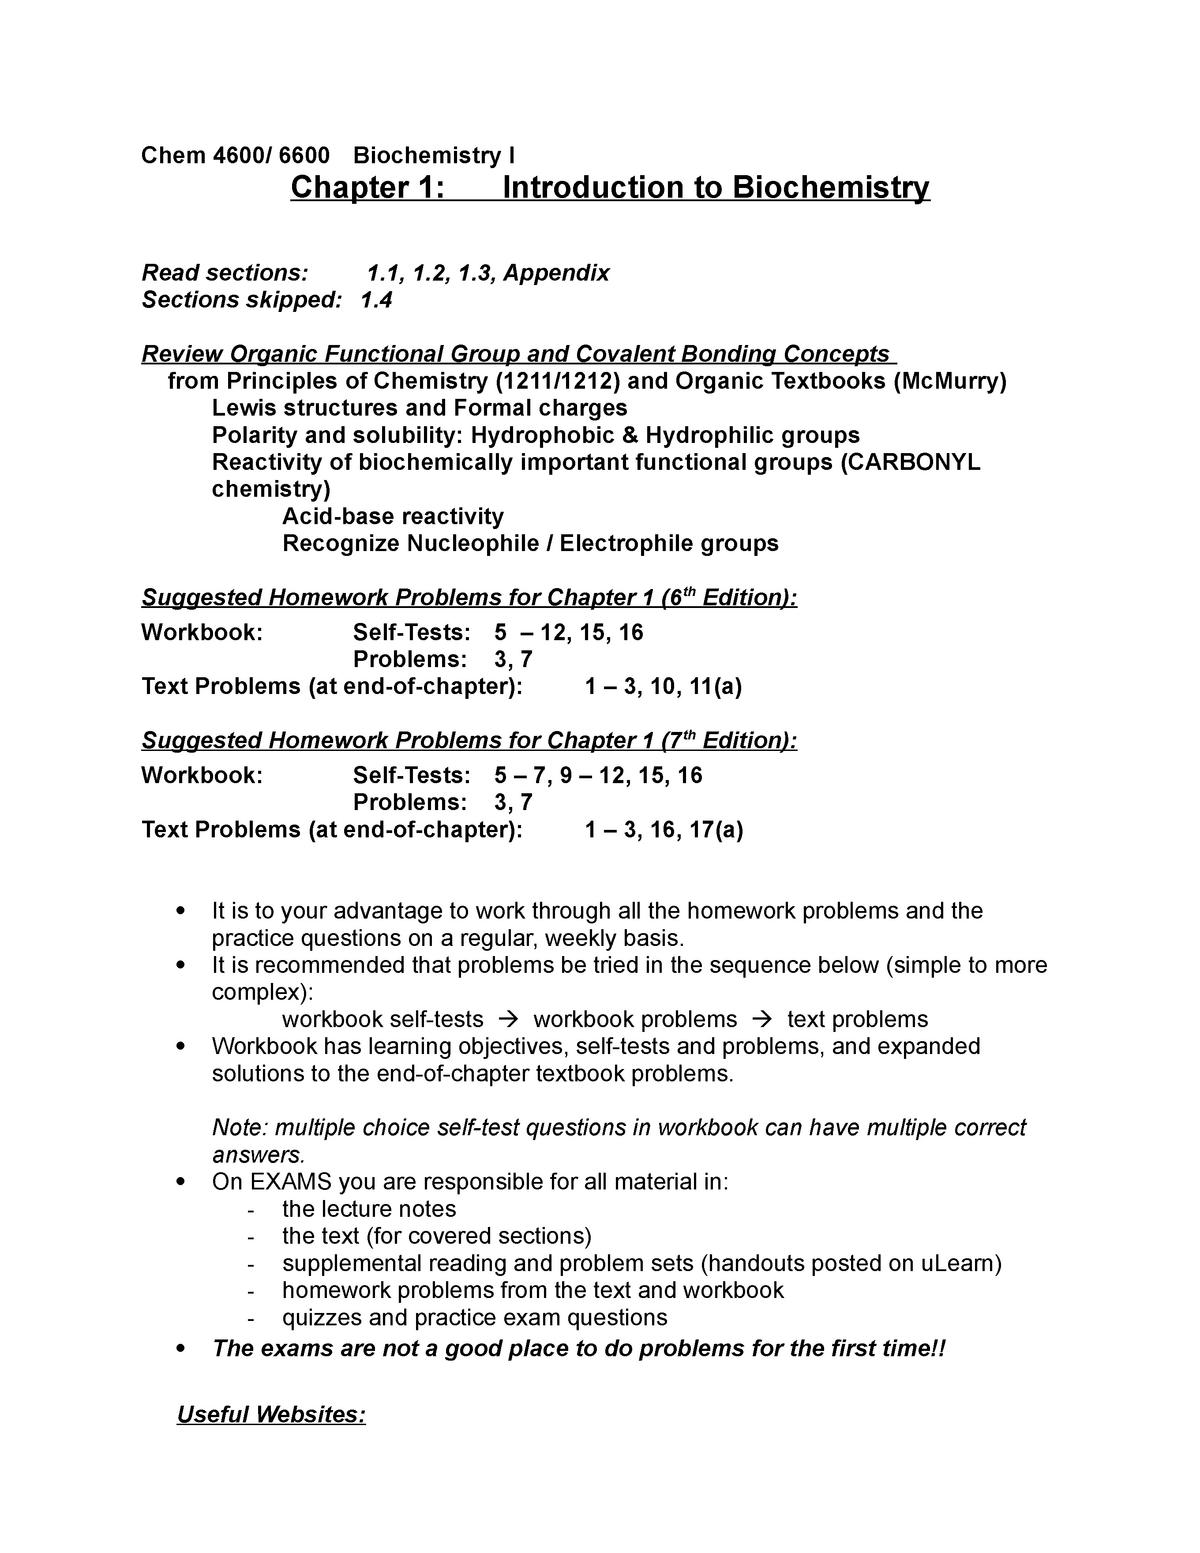 Chap 1 Suggested Problems - CHEM 4600: Biochemistry I - StuDocu